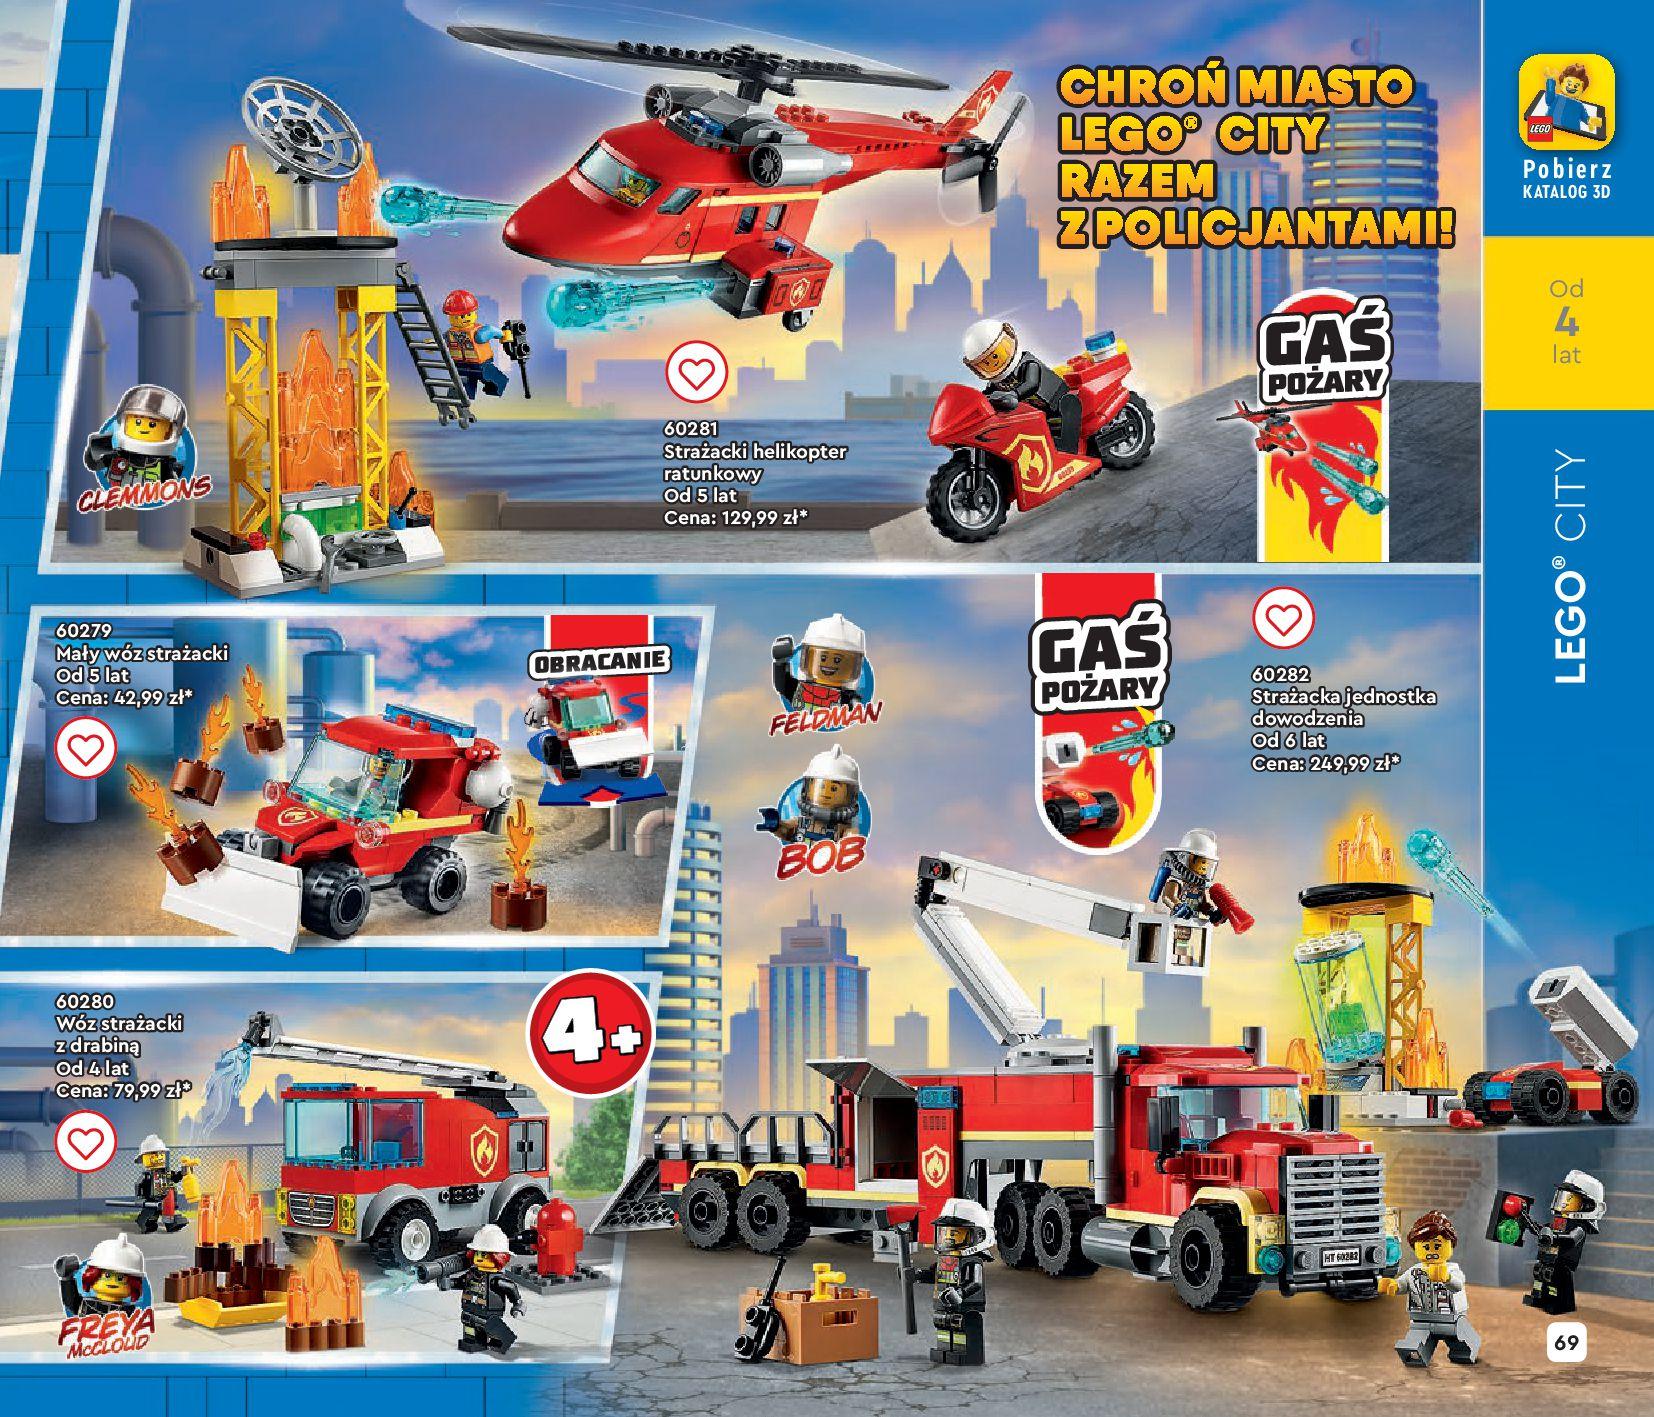 Gazetka LEGO: Gazetka LEGO - katalog 2021-06-30 page-69